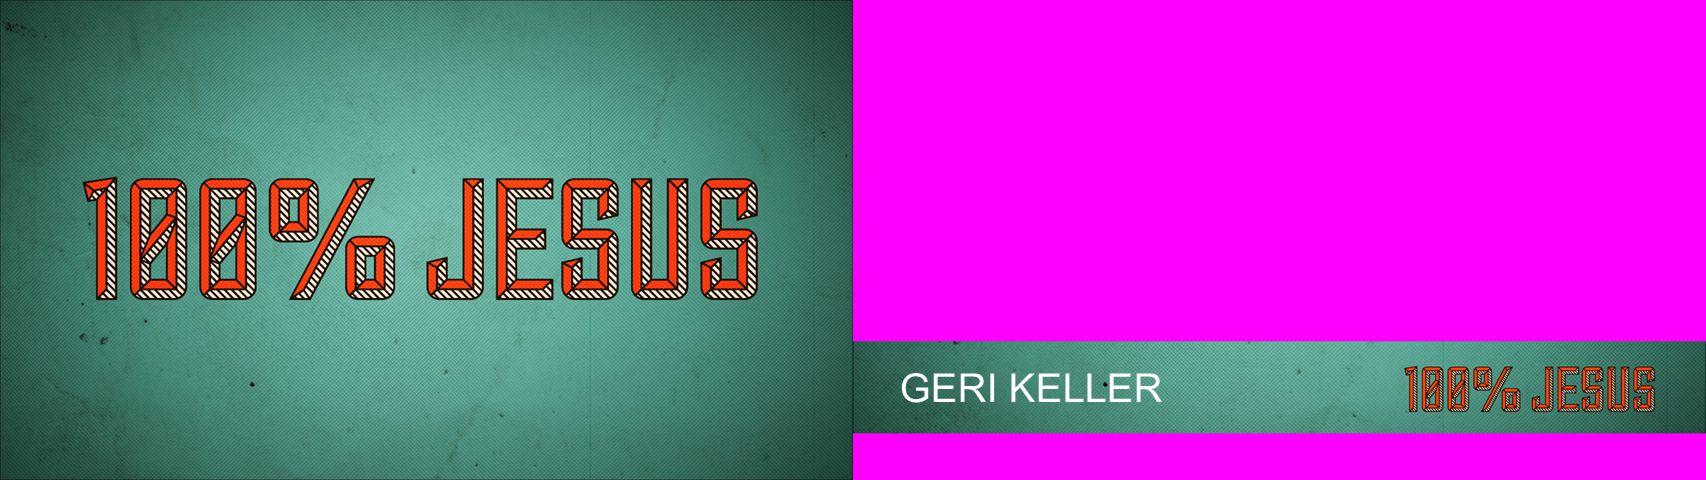 GERI KELLER Serienlogo